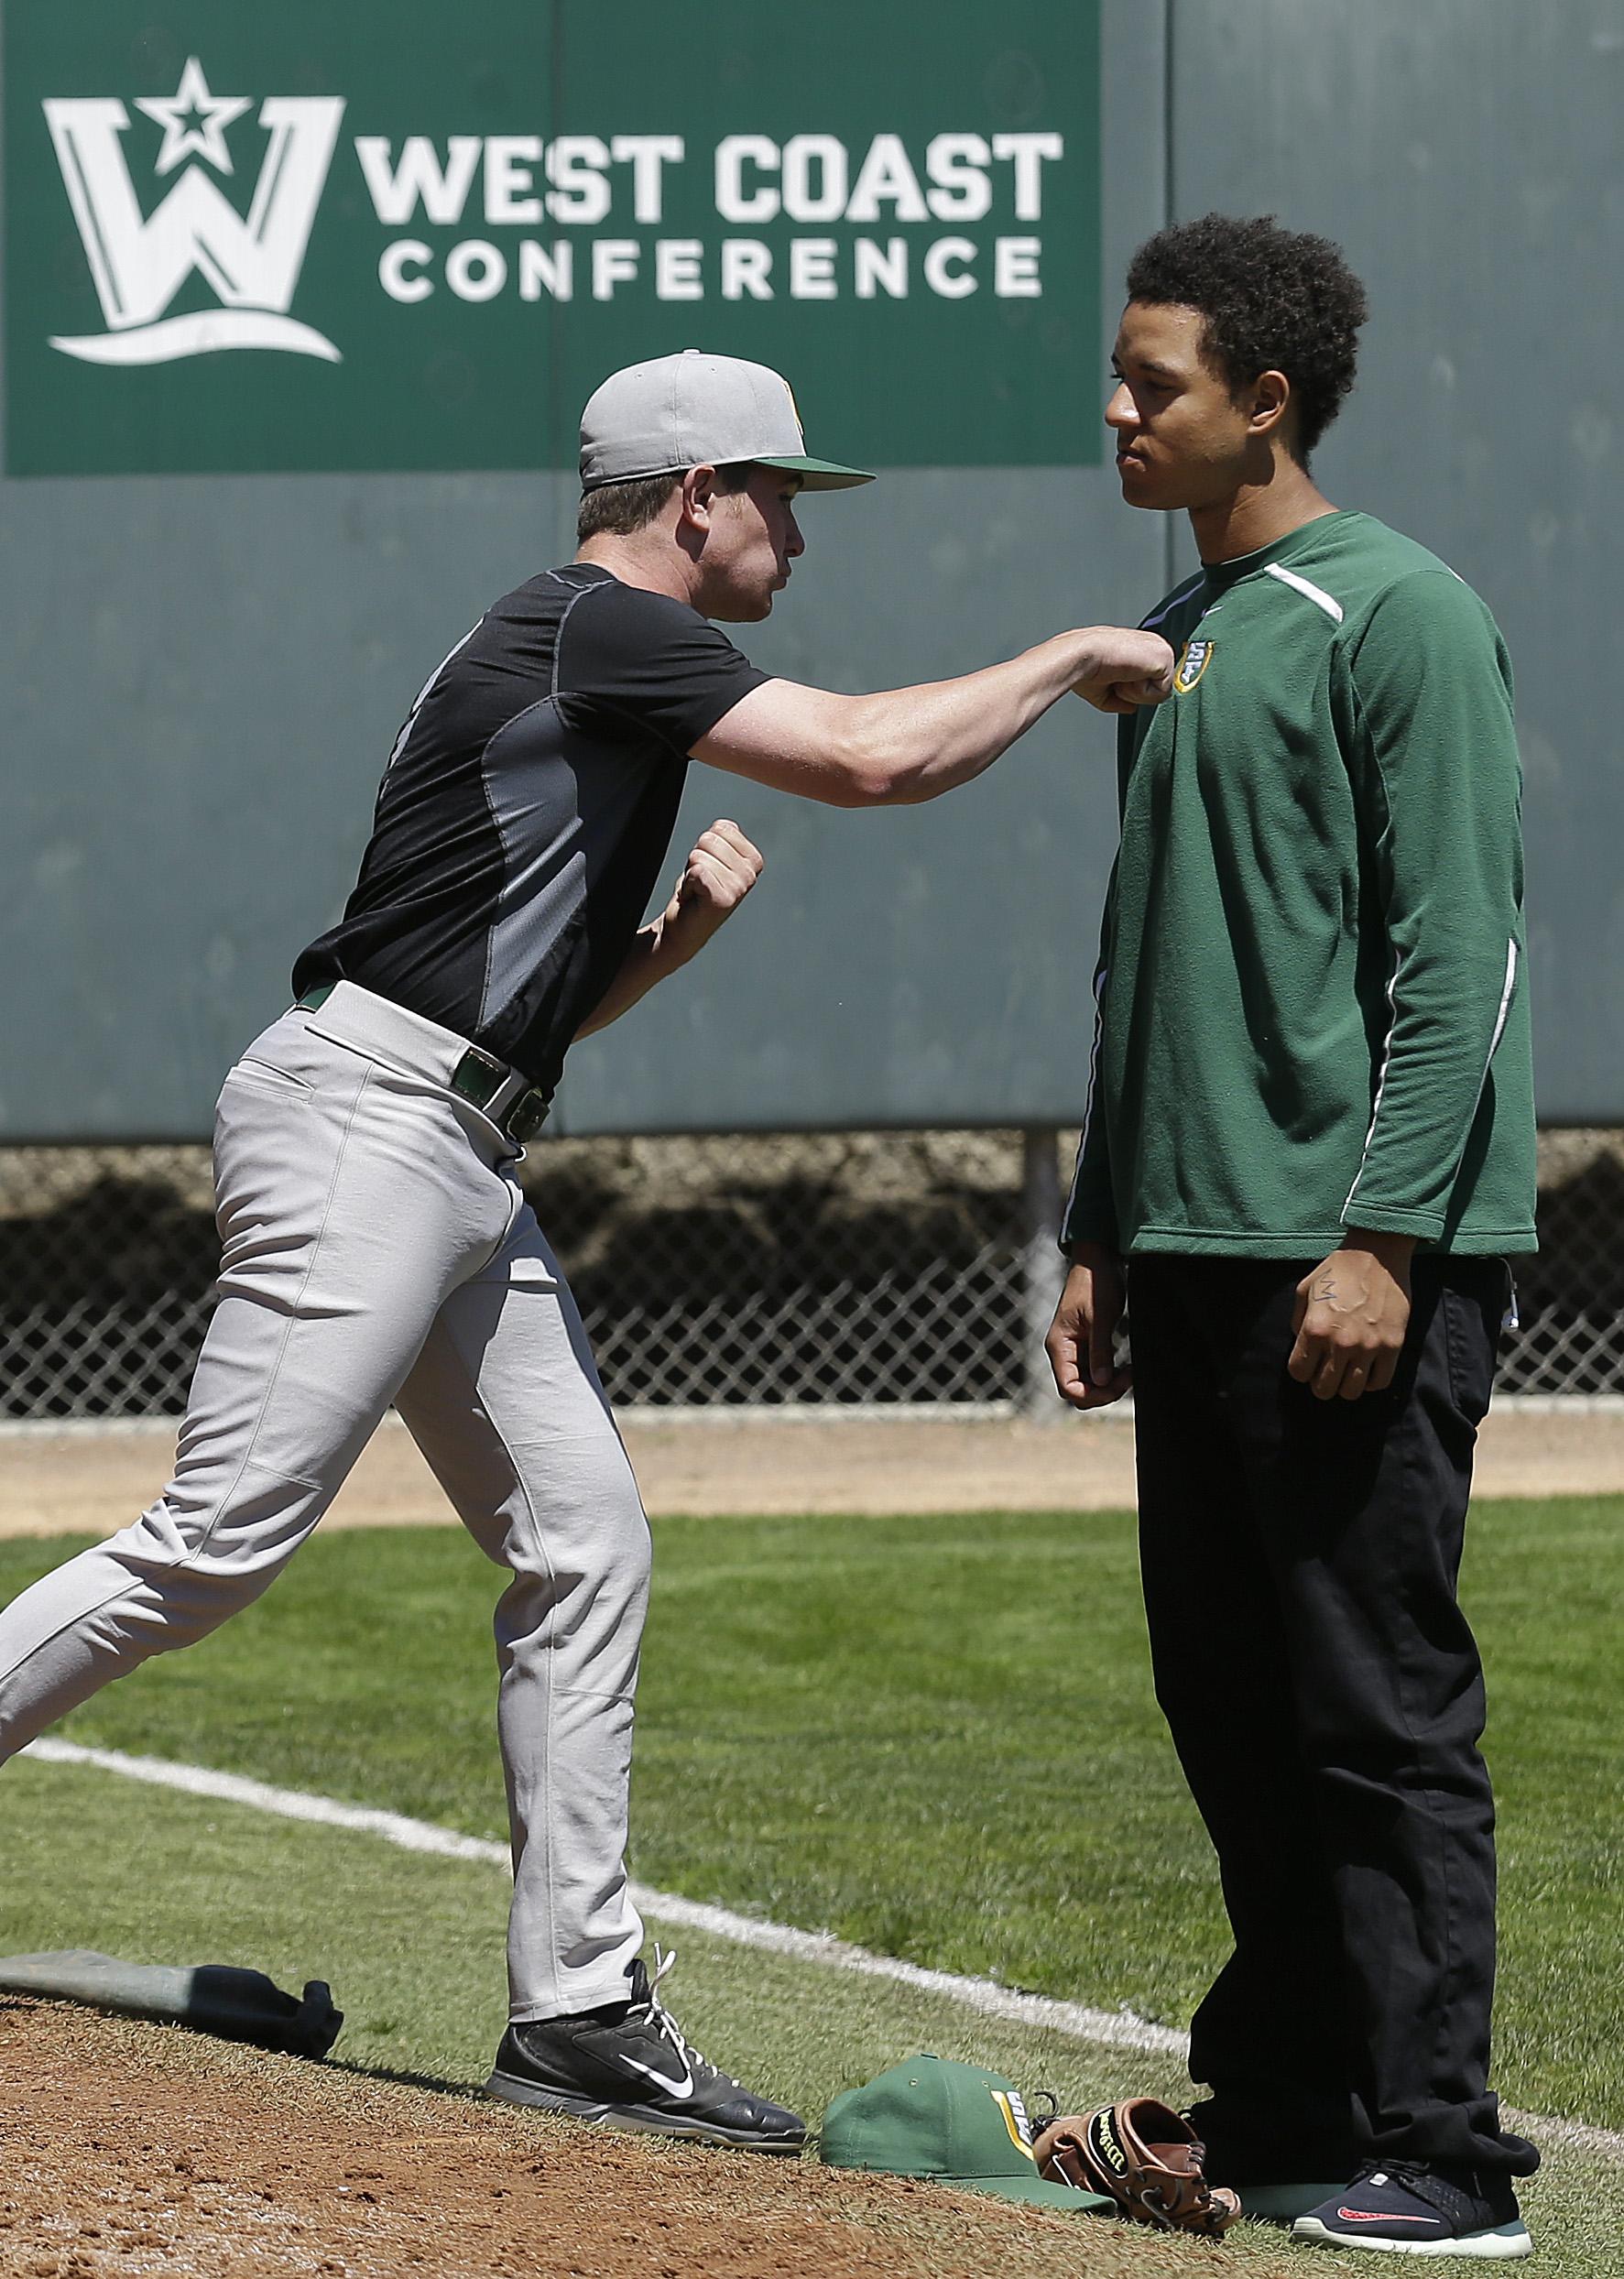 Manny Ramirez Jr vows to make own baseball name for himself